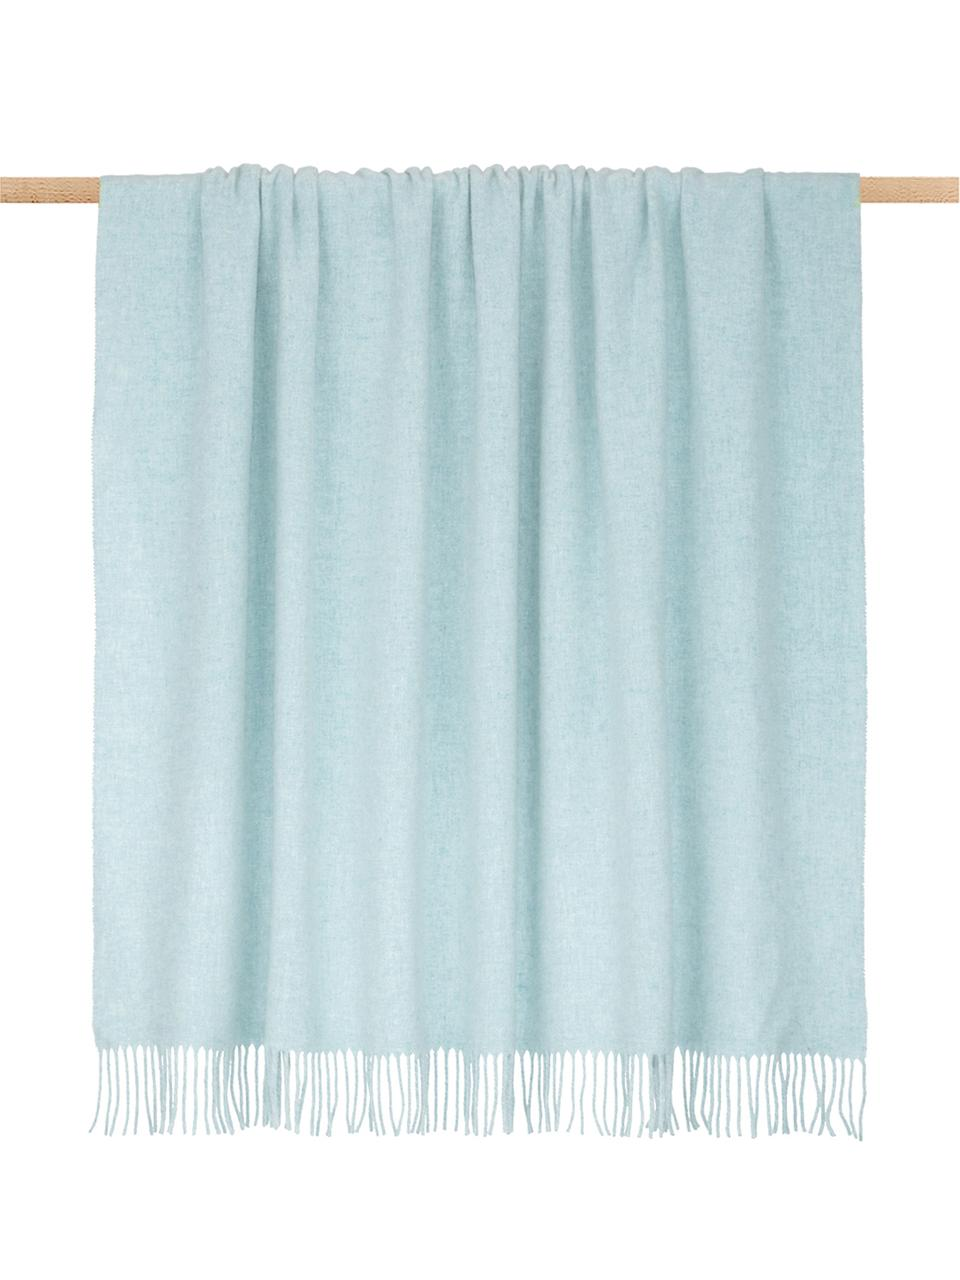 Plaid in lana leggero con finitura a frange Patriciu, 100% lana, Verde blu, Larg. 130 x Lung. 170 cm